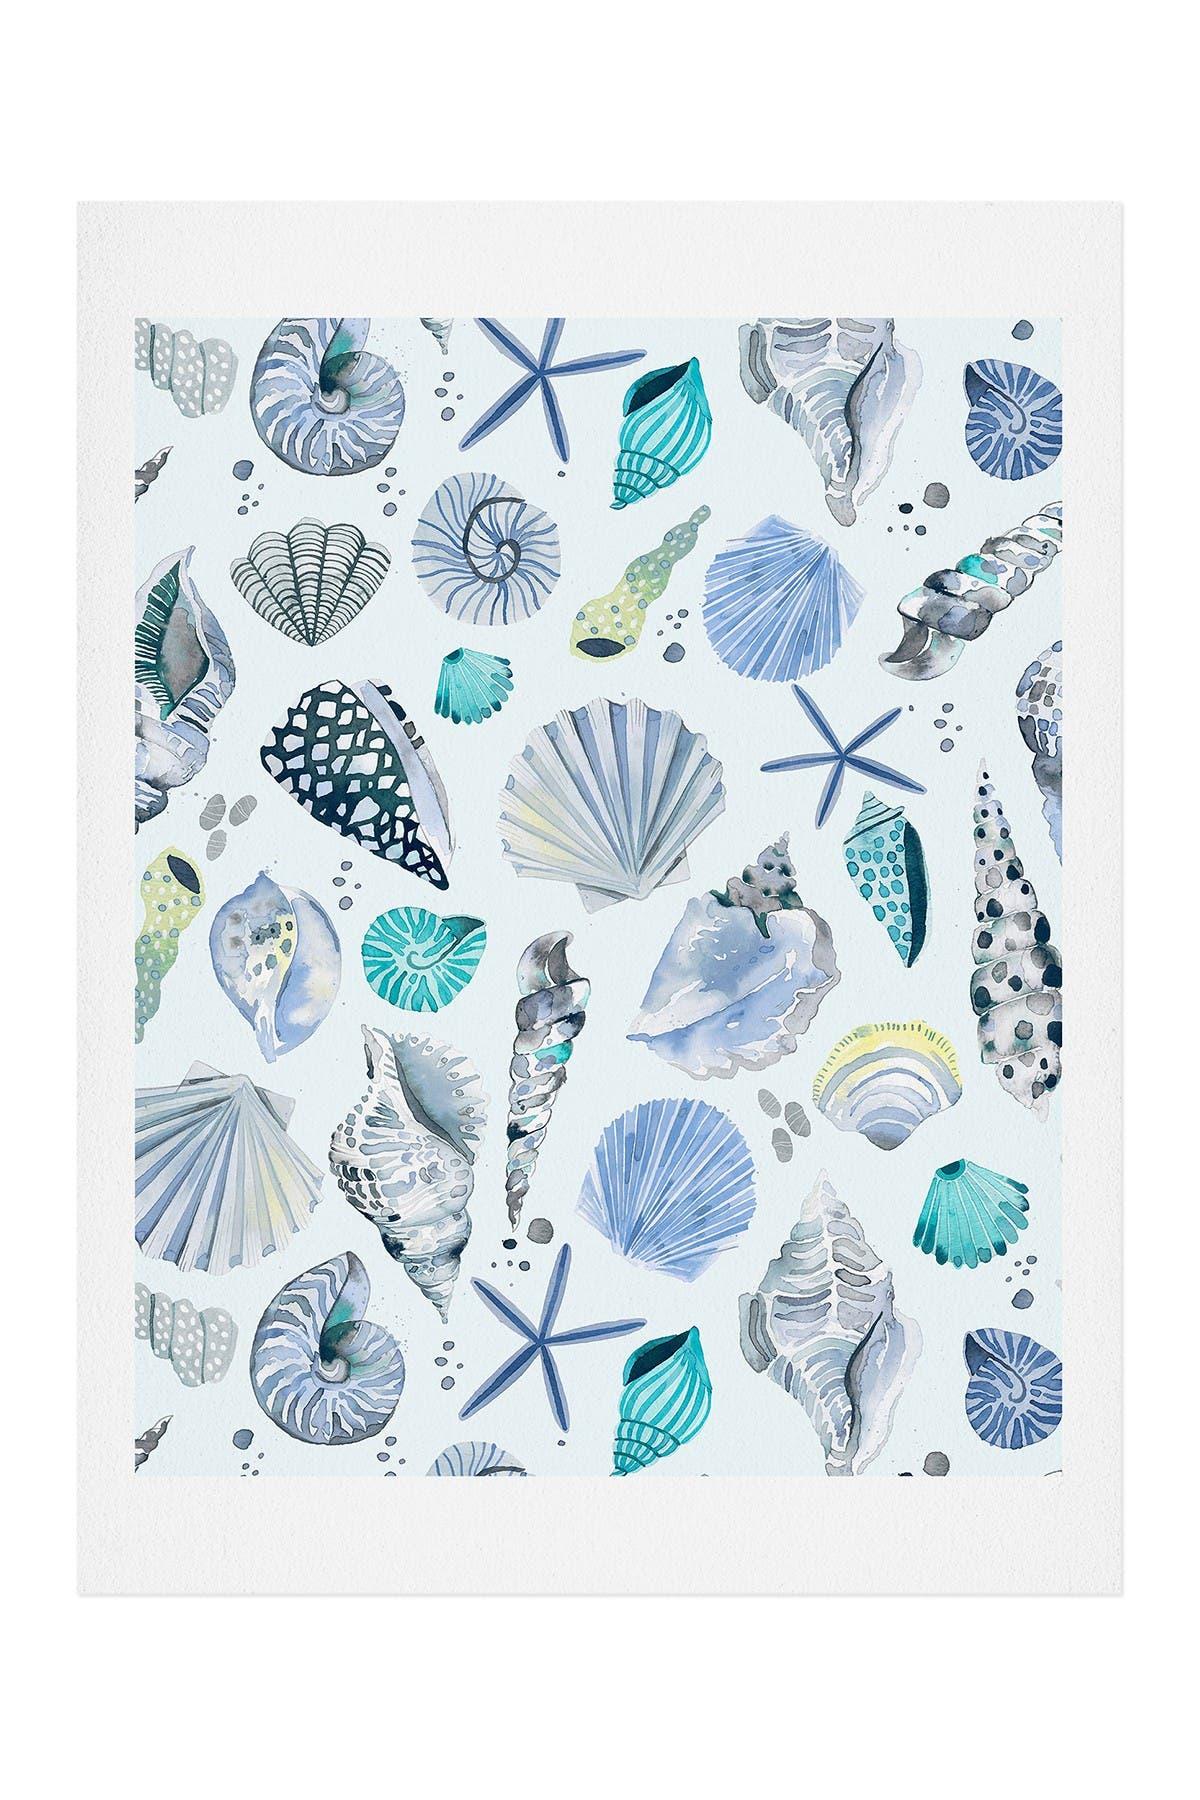 Image of Deny Designs Ninola Design Sea Shells Soft blue Art Print